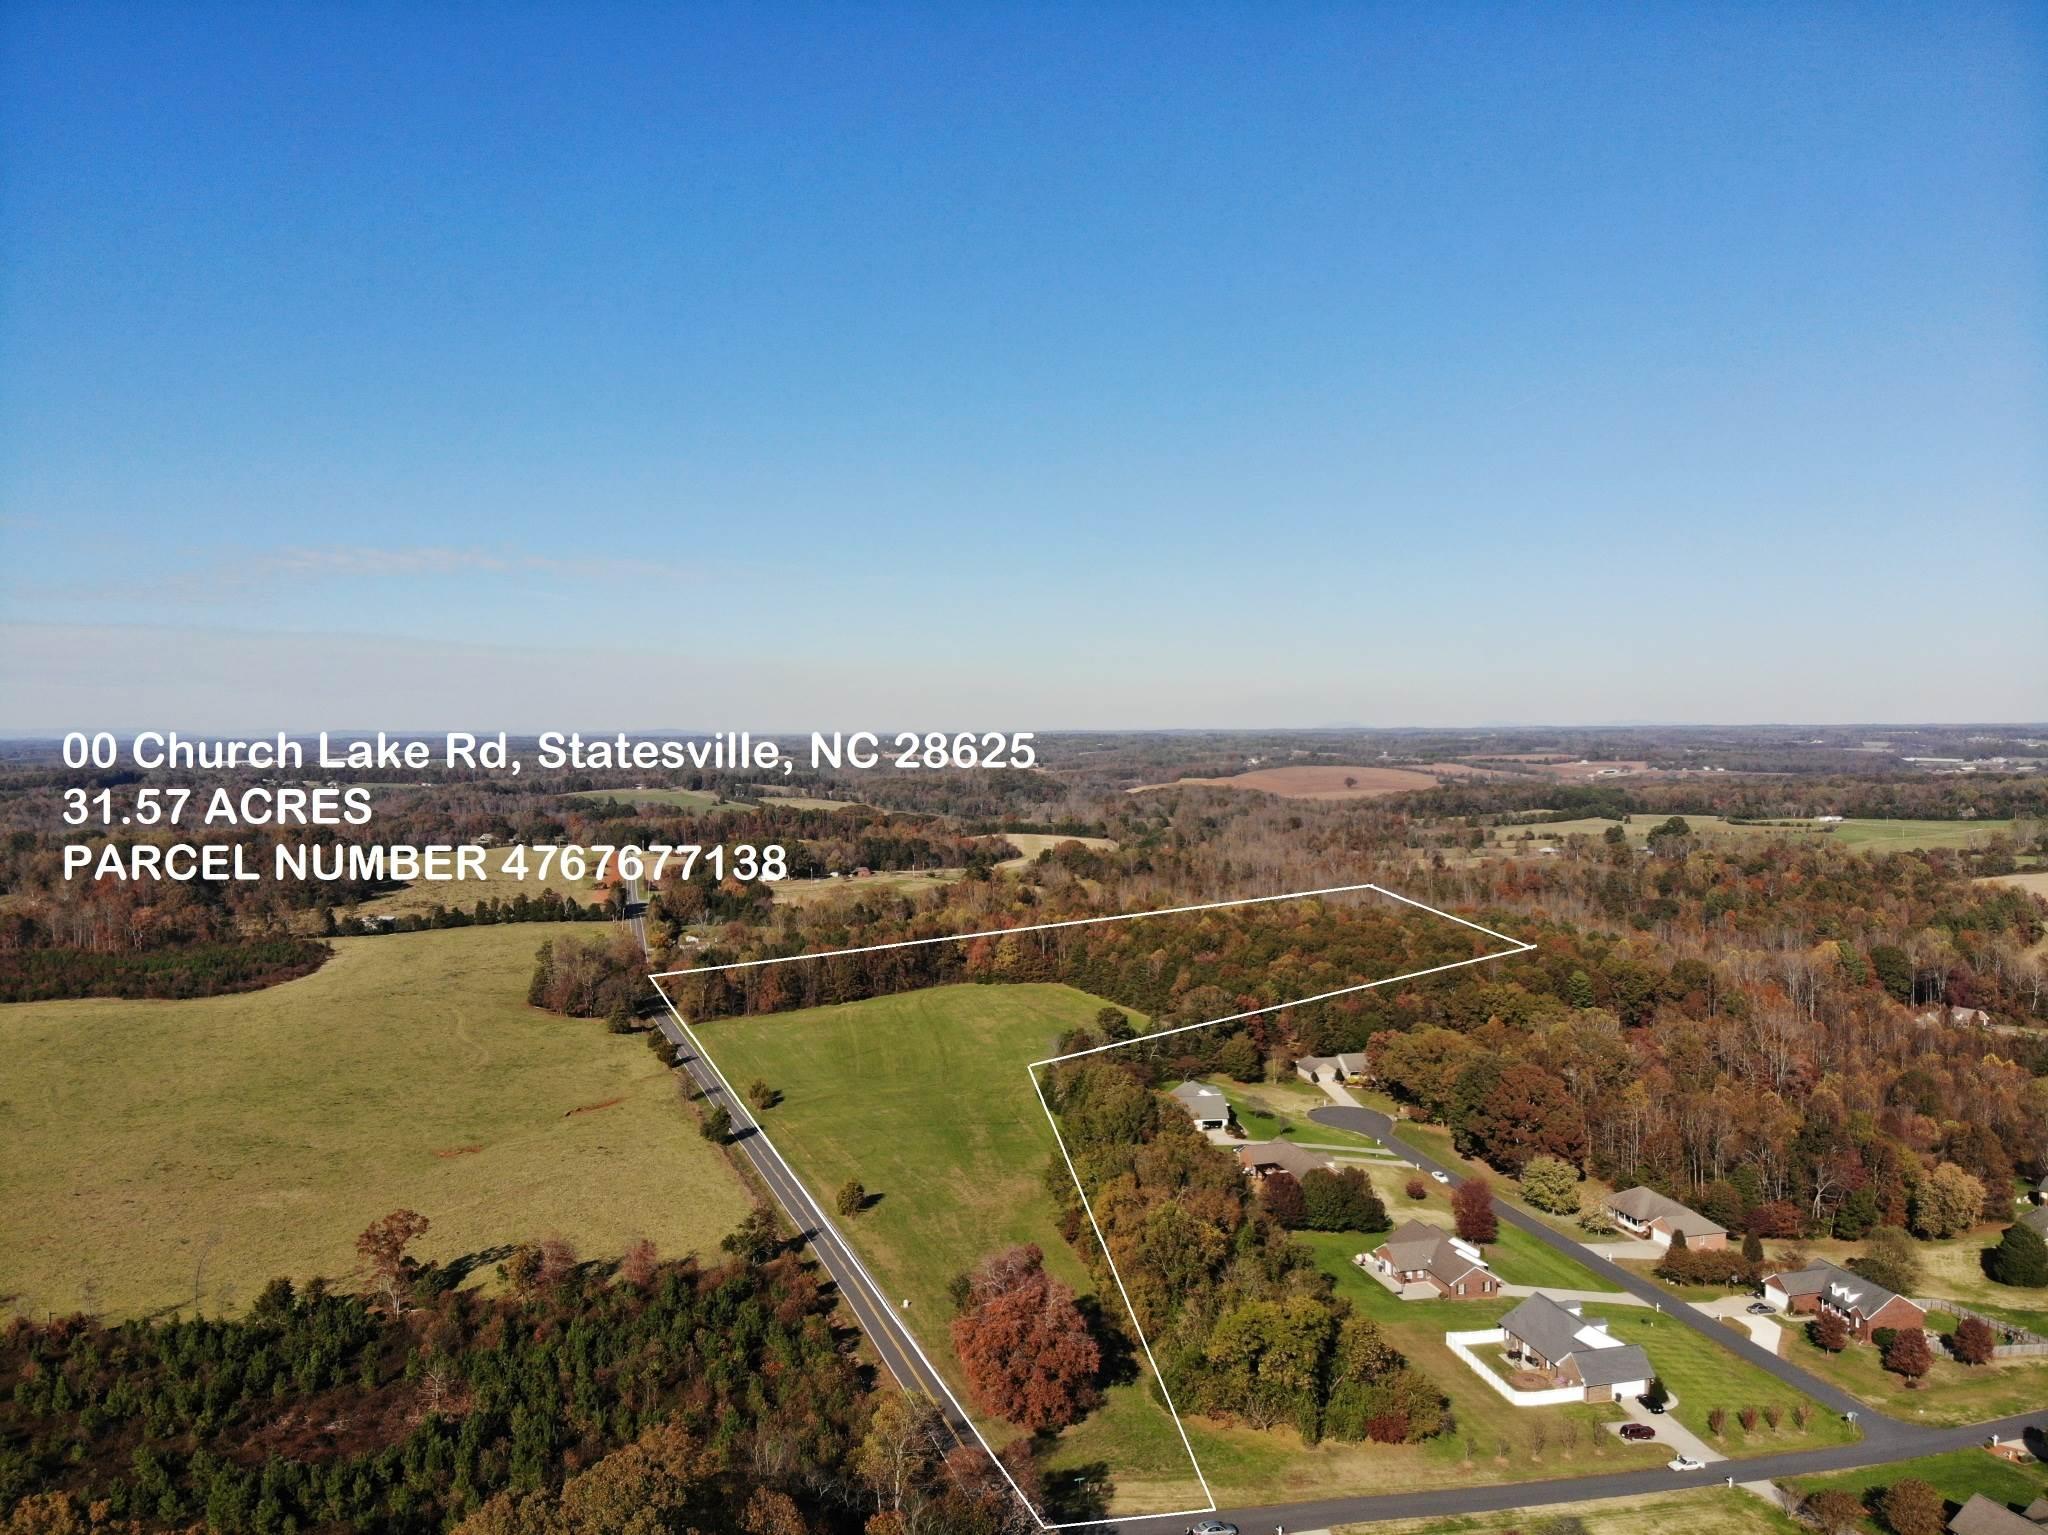 00 Church Lake Road, Statesville, NC 28625